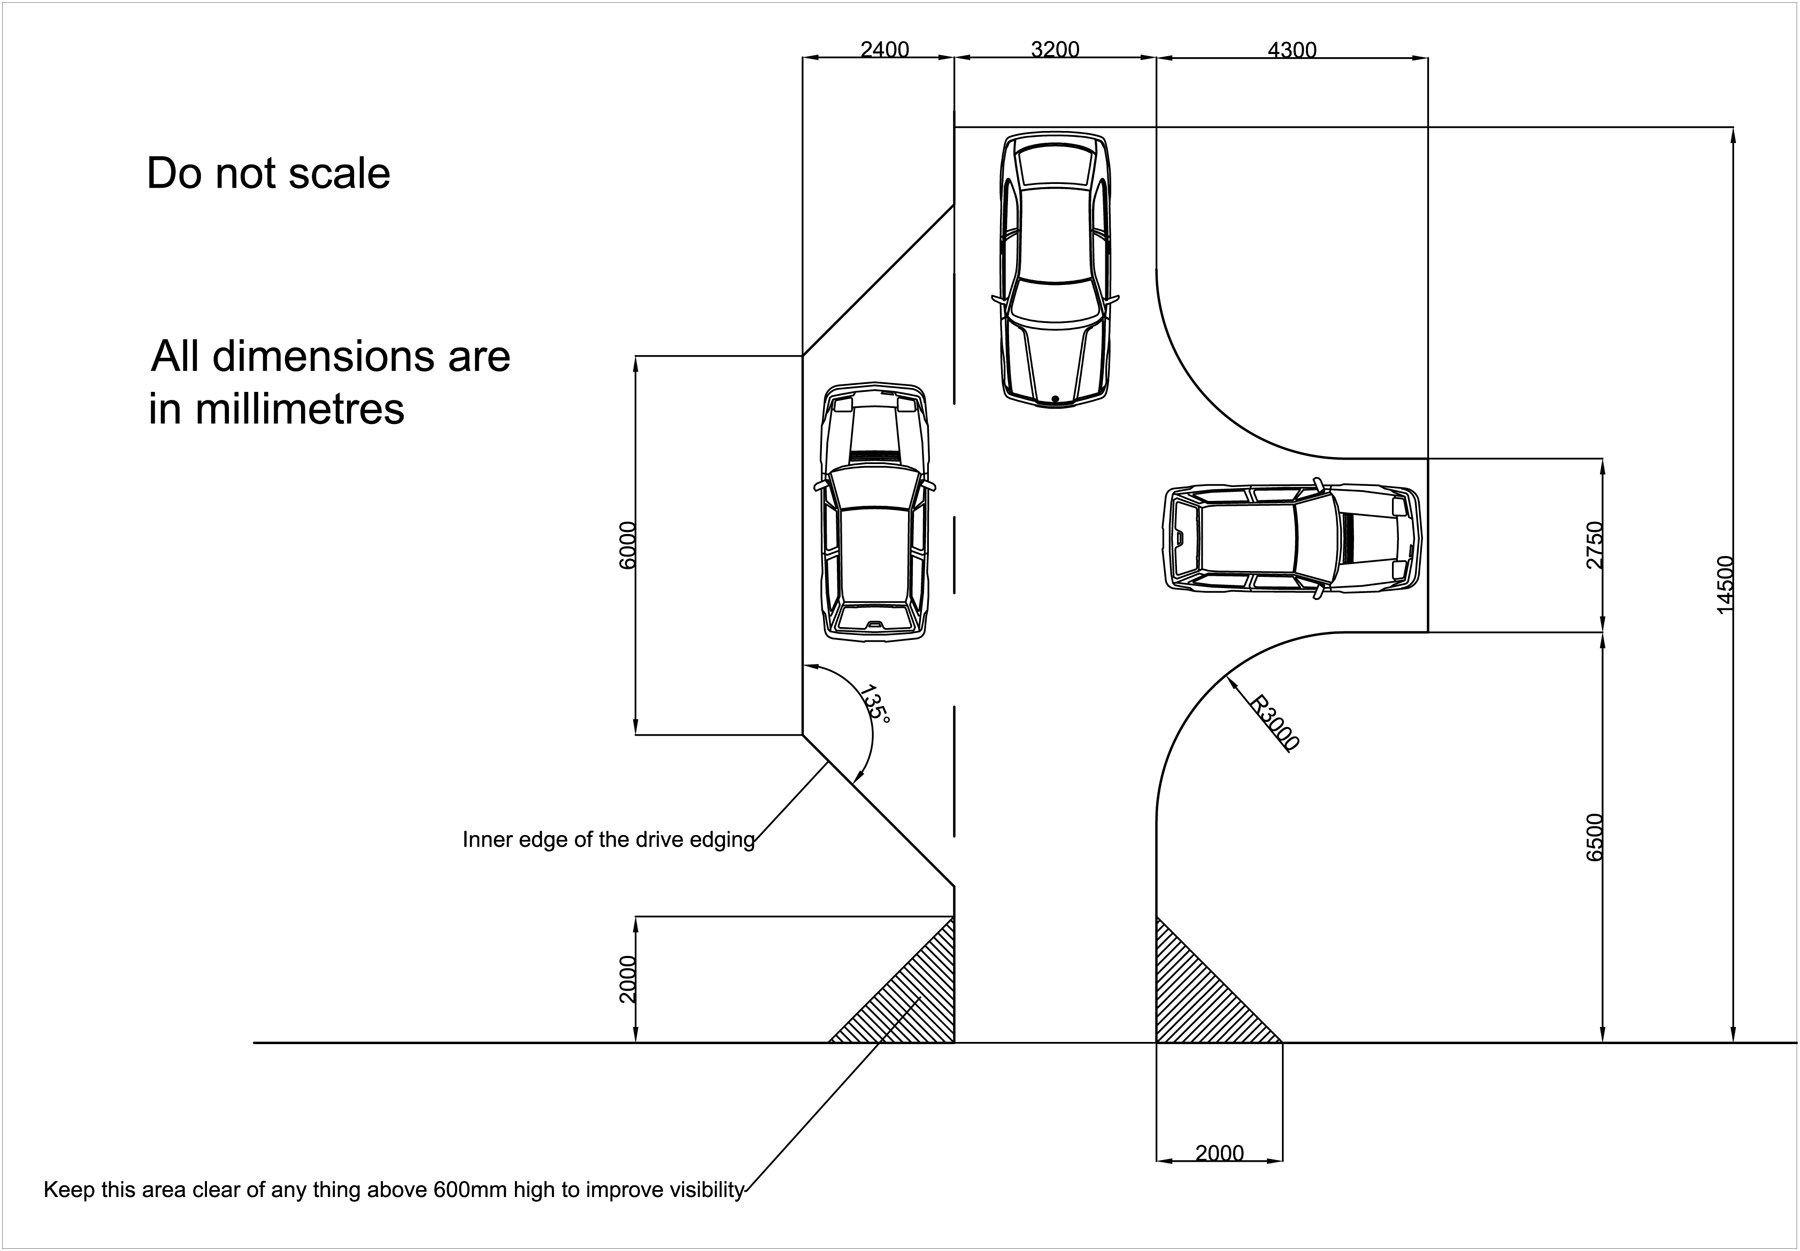 Driveway Turning Radius For Cars Driveway design